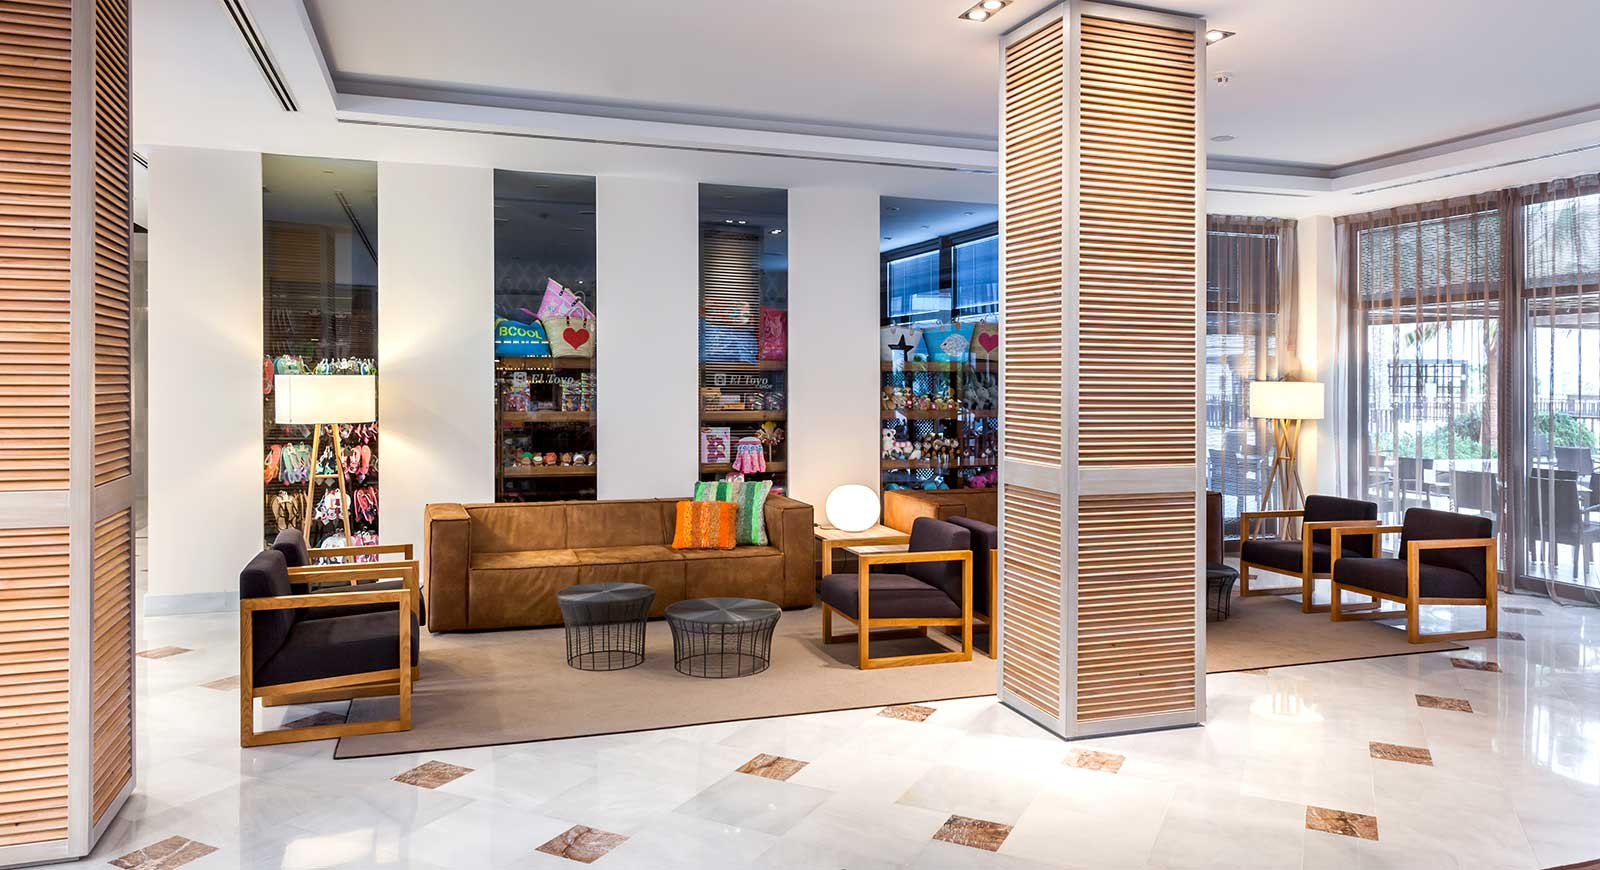 236-facilities-9-hotel-barcelo-cabo-de-gata_tcm20-8437_w1600_h870_n.jpg